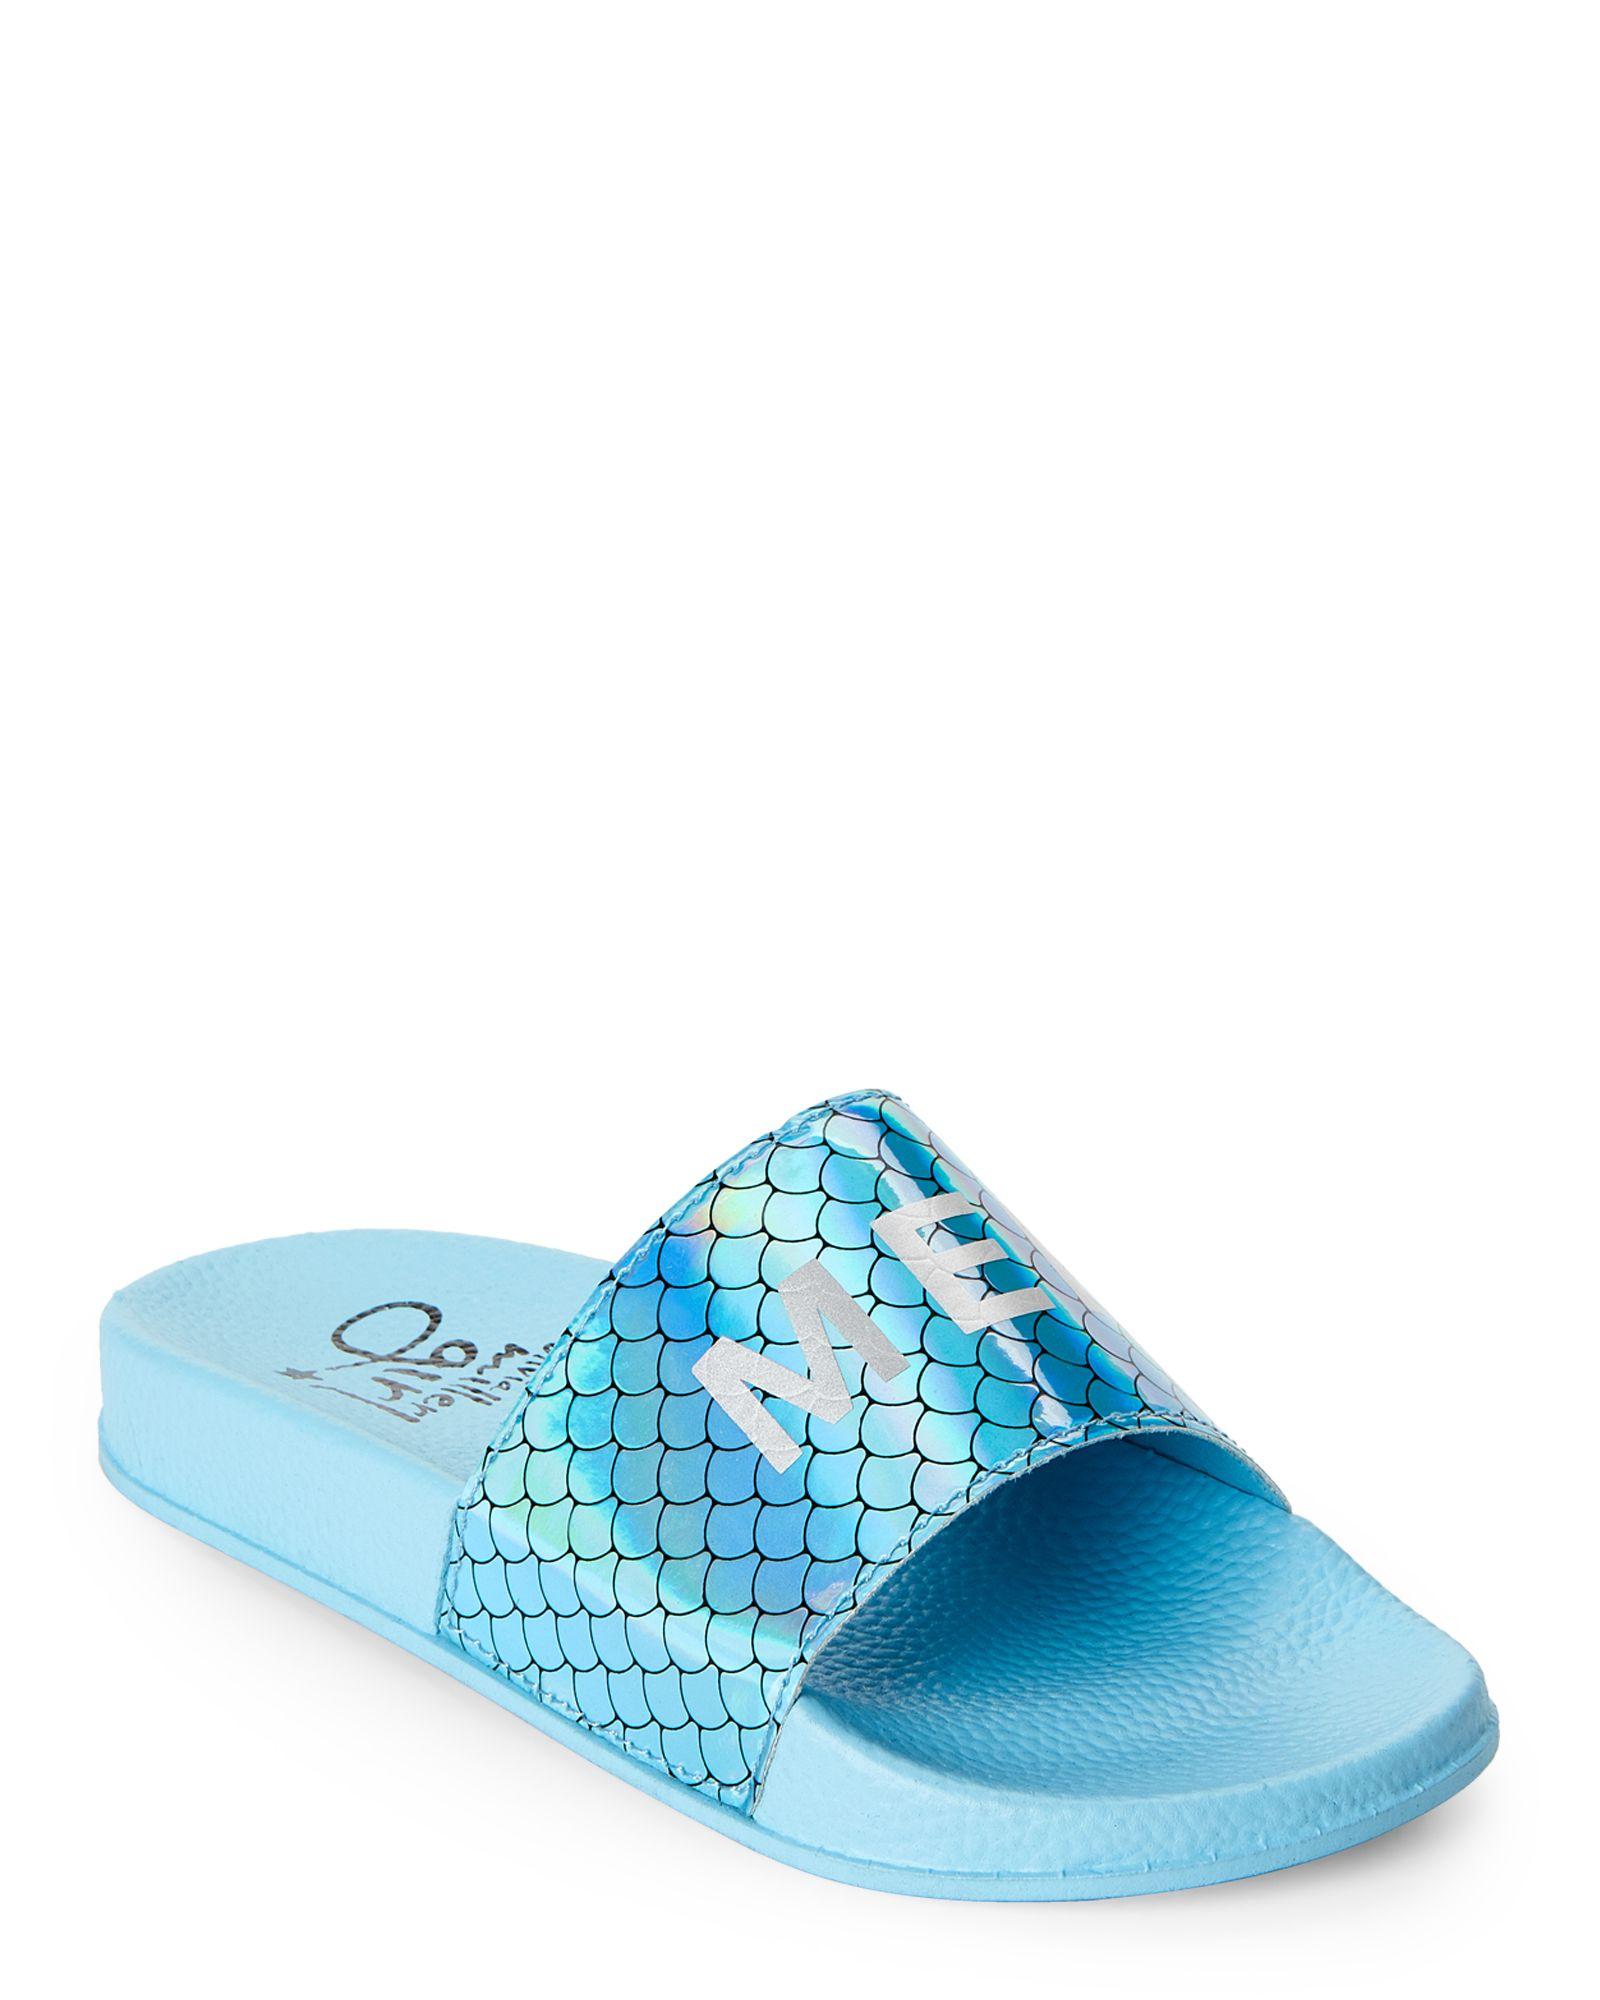 bd7445a437dd9 Olivia Miller Girl (Kids Girls) Blue Mermaid Slide Sandals ...